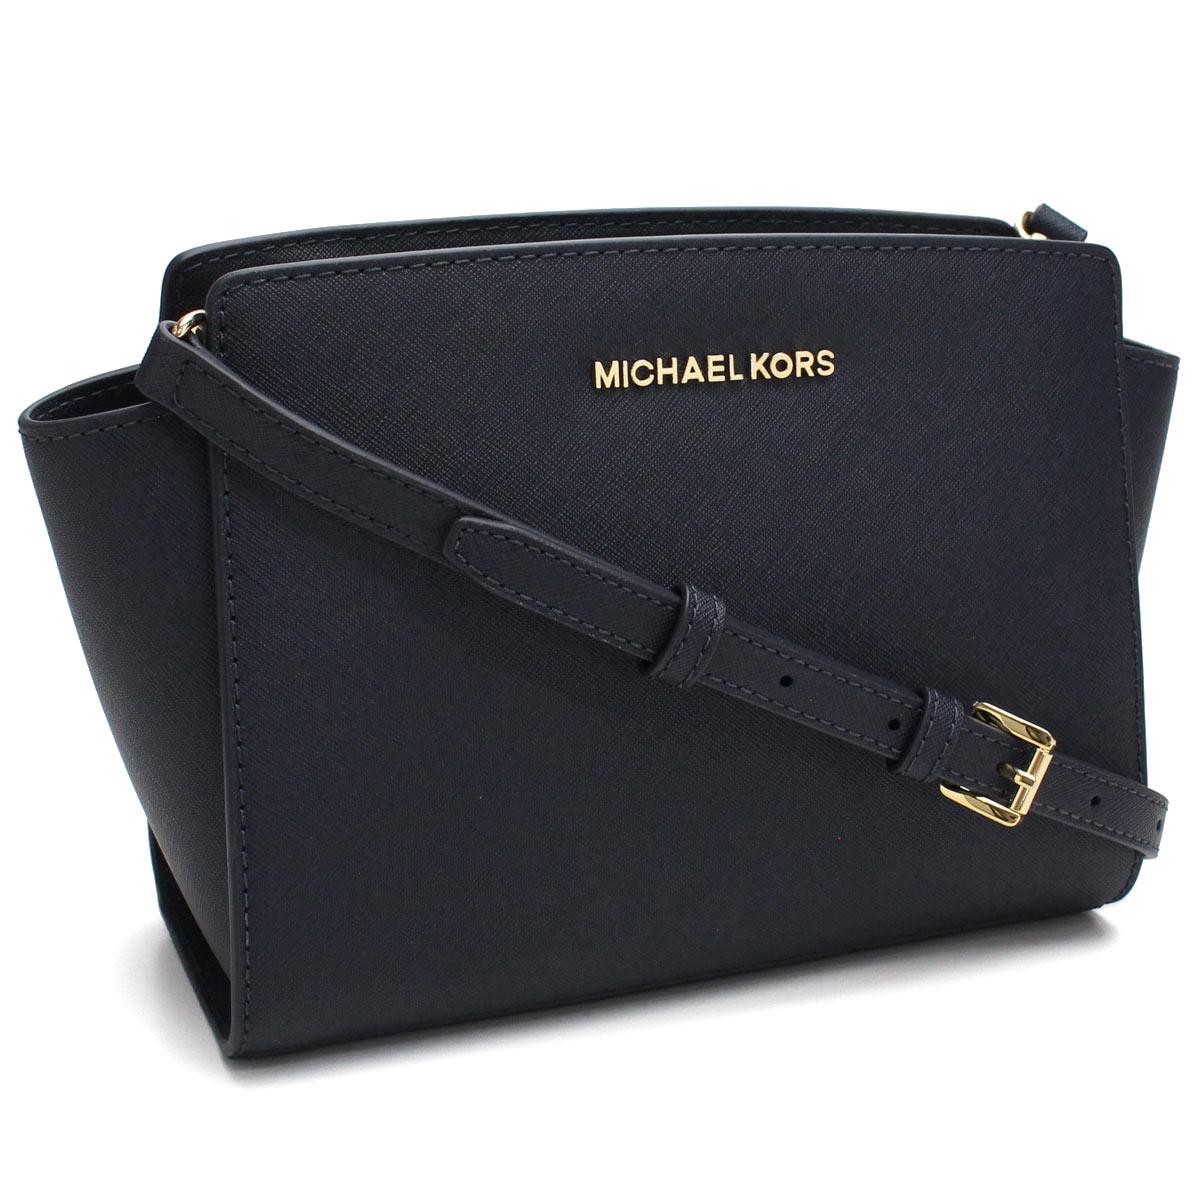 b98ab8137b9f Bighit The total brand wholesale  Take Michael Kors (MICHAEL KORS) SELMA  Selma slant  shoulder bag 30T3GLMM2L ADMIRAL navy system